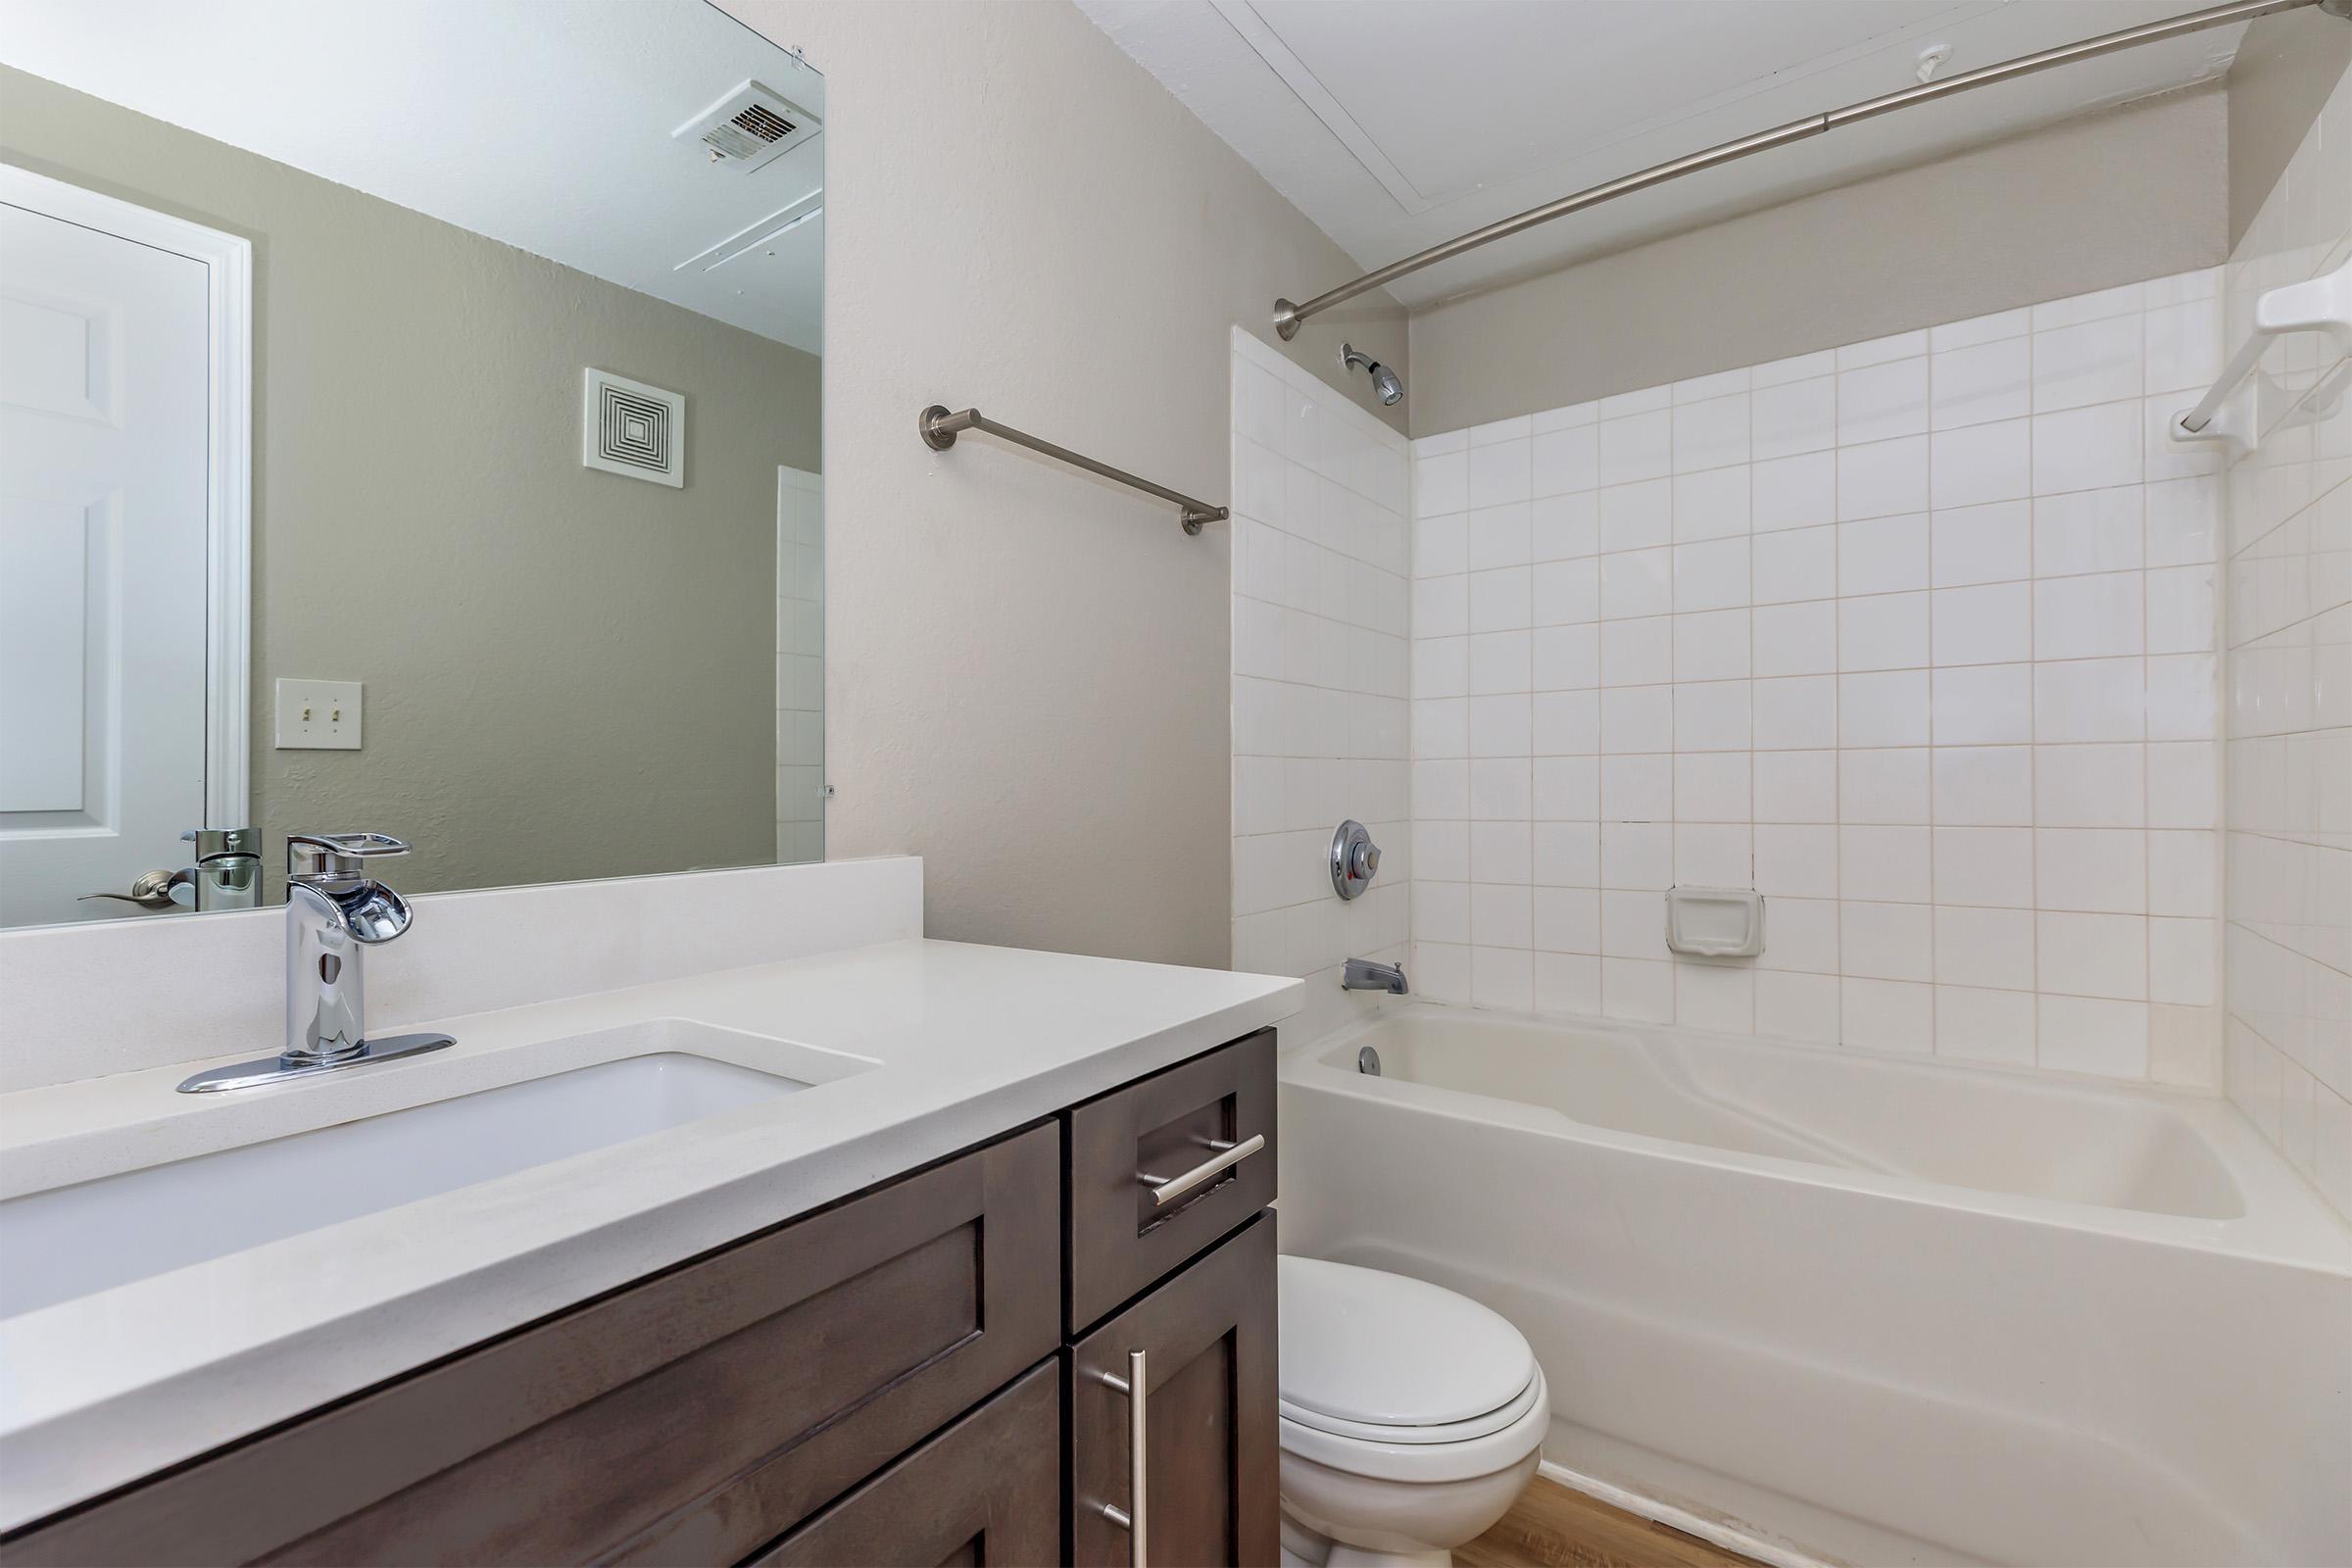 Bathroom at The Ridgeleigh at Van Dorn in Alexandria, VA